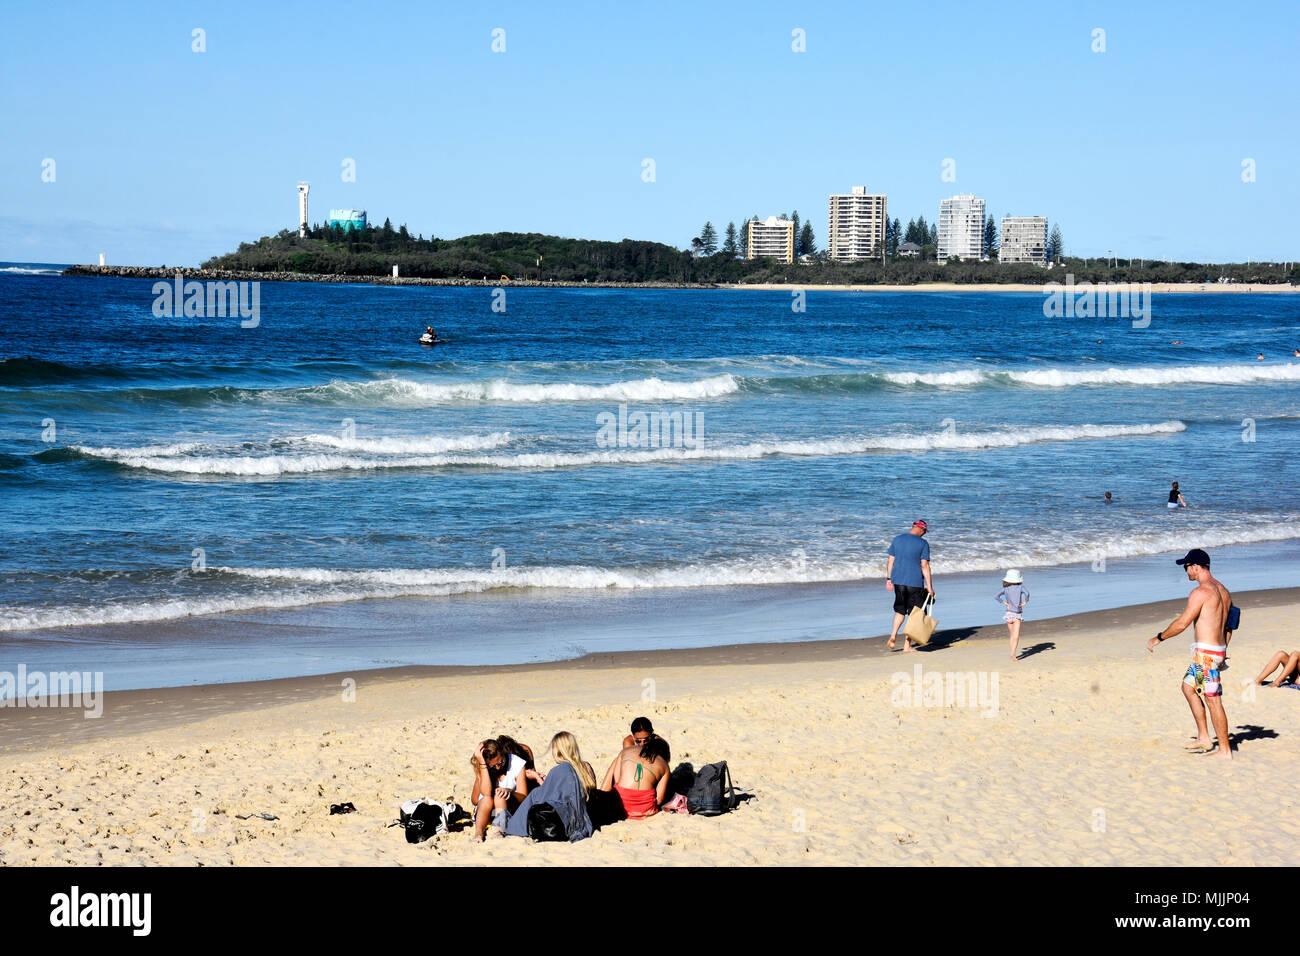 CROWDS OF PEOPLE ENJOYING BEAUTIFUL MOOLOOLABA BEACH IN QUEENSLAND AUSTRALIA Stock Photo